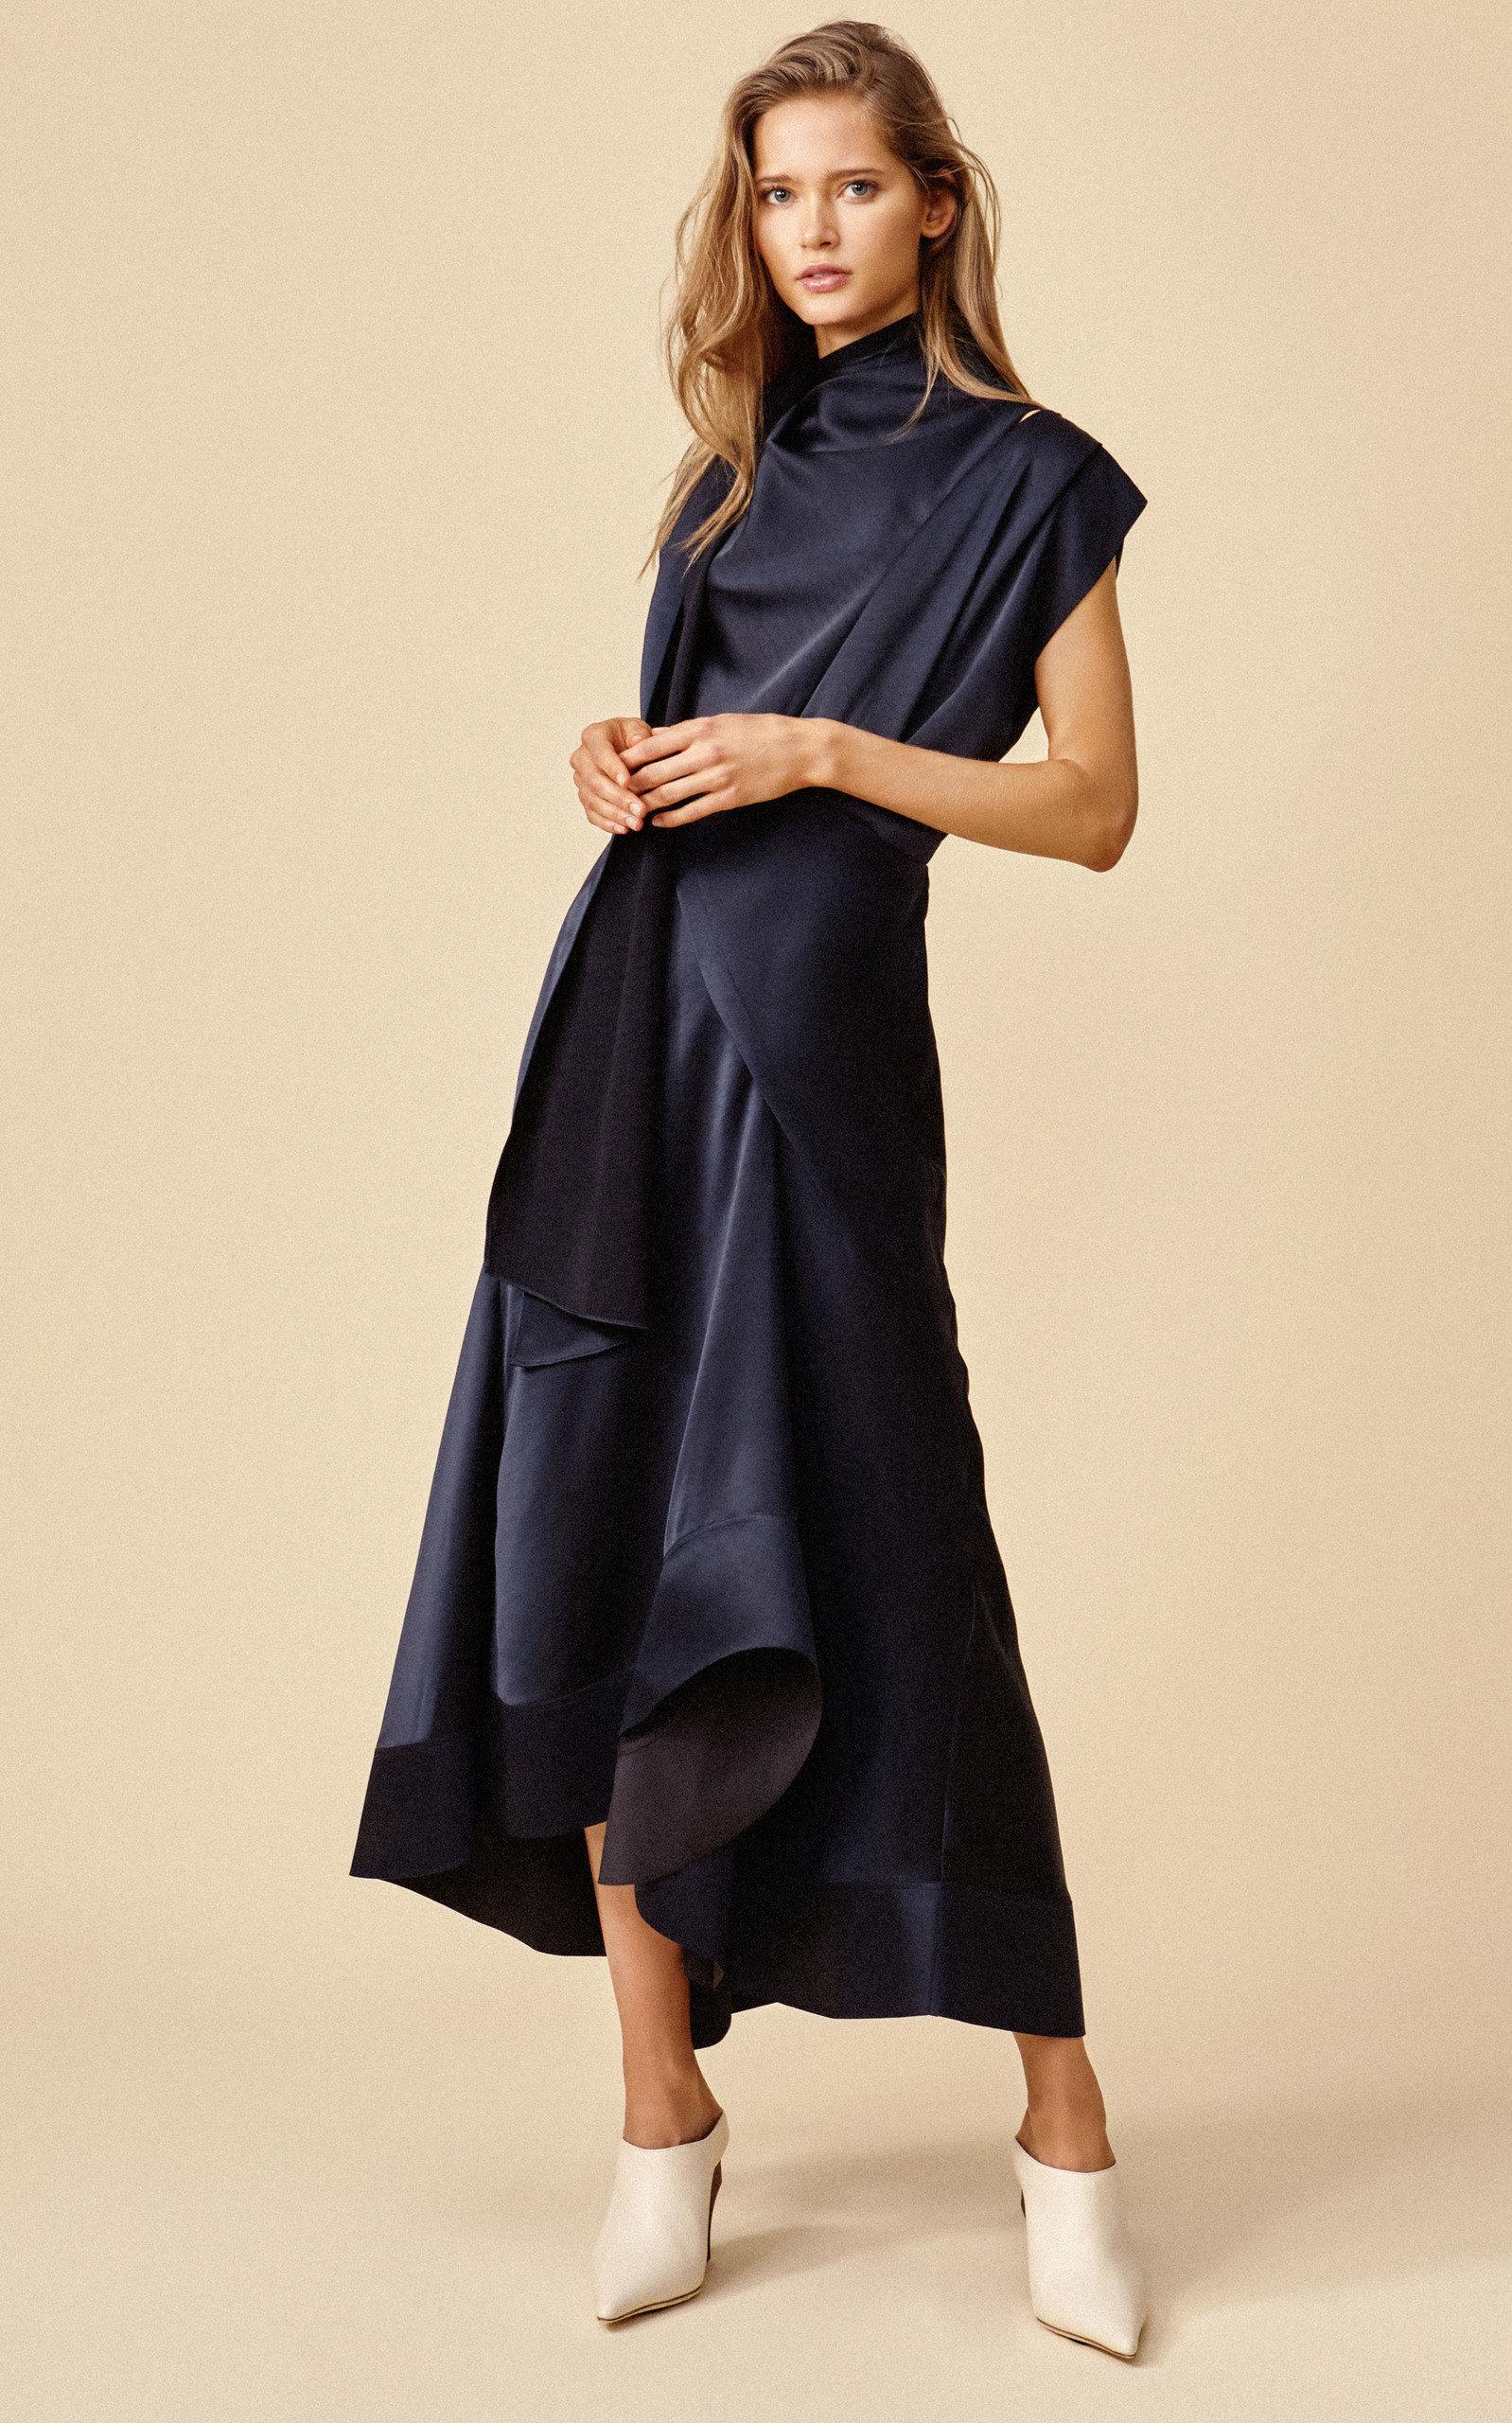 Acler Dresses Dalisay Draped Midi Dress